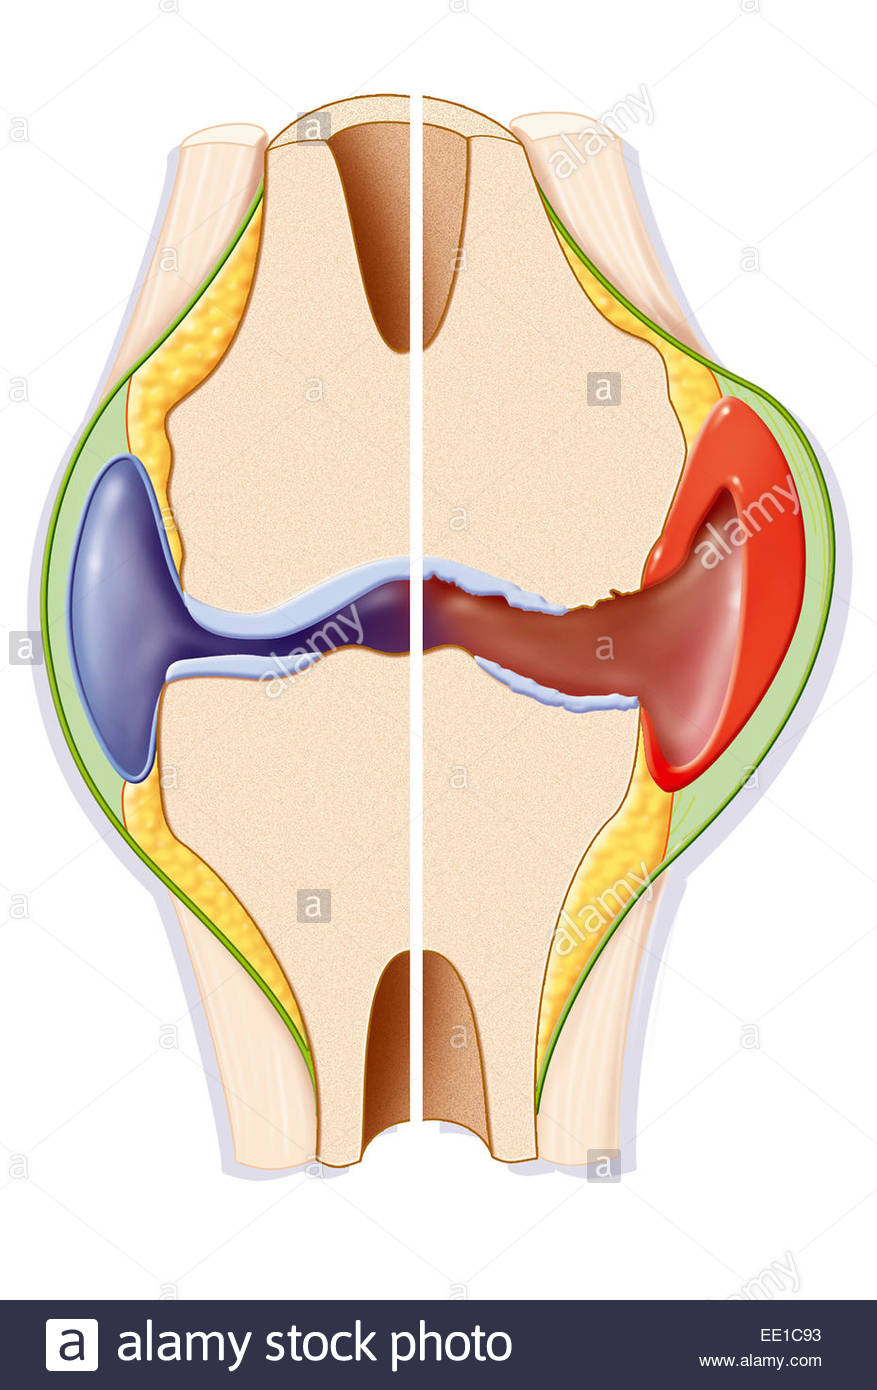 877x1390 Rheumatoid Arthritis, Drawing Stock Photo 77478271